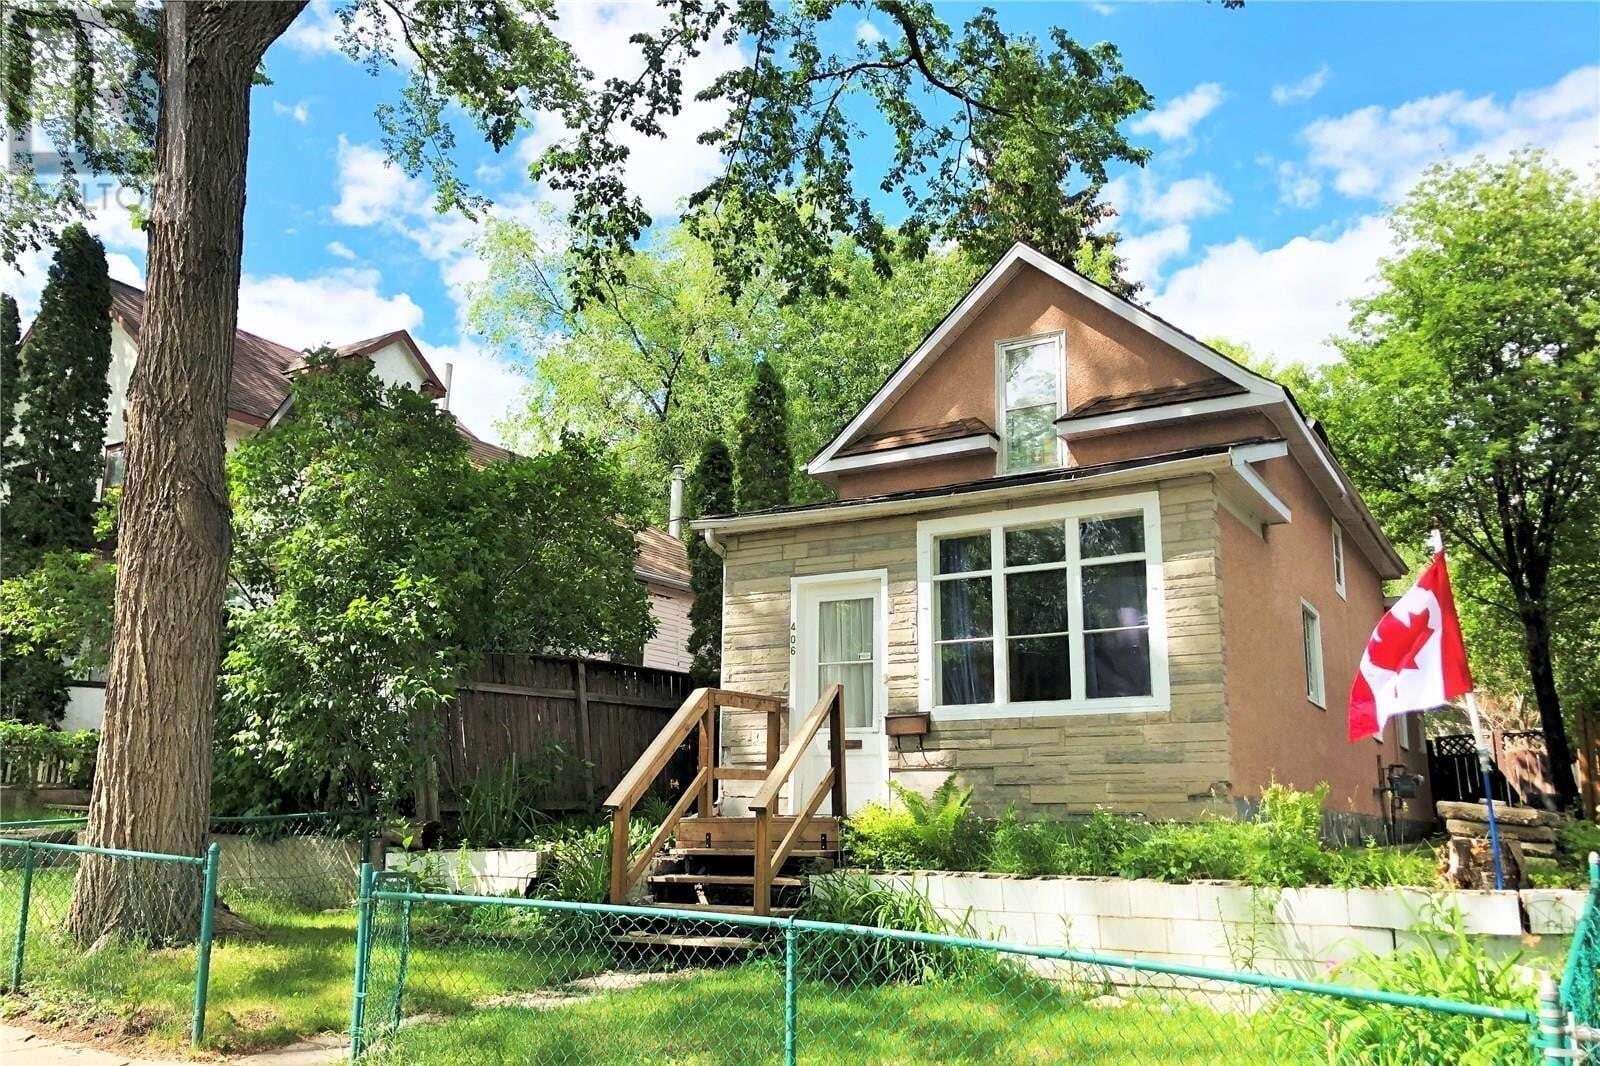 House for sale at 406 26th St W Saskatoon Saskatchewan - MLS: SK815048